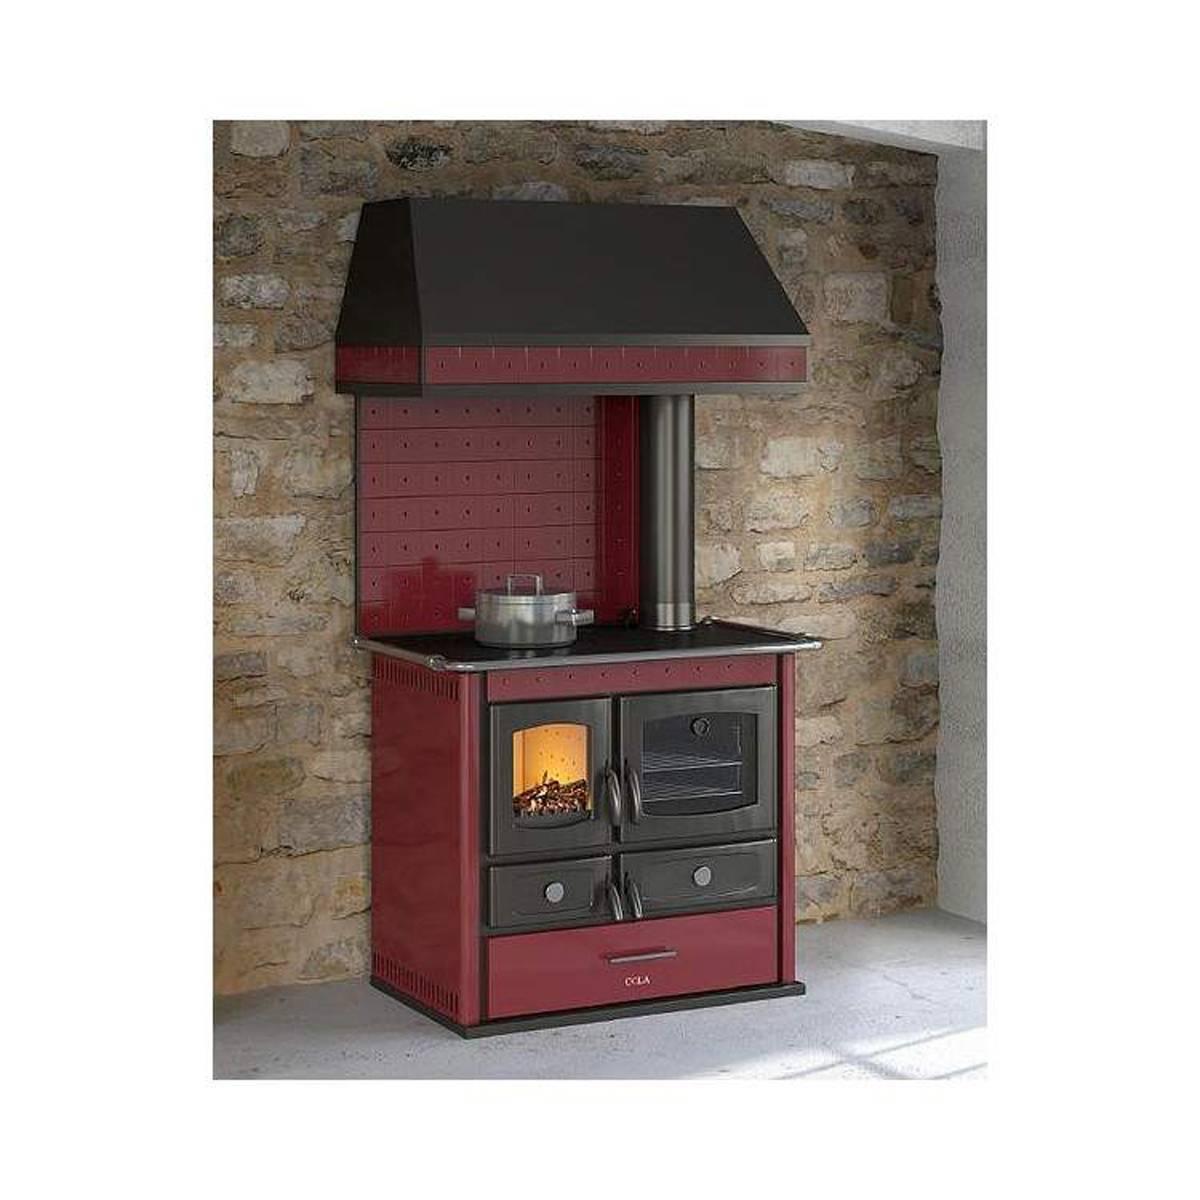 Cucina a legna idro anselmo cola termo helena rustic 14kw in acciaio e ceramica quaranta store - Stufe a legna cucina ...